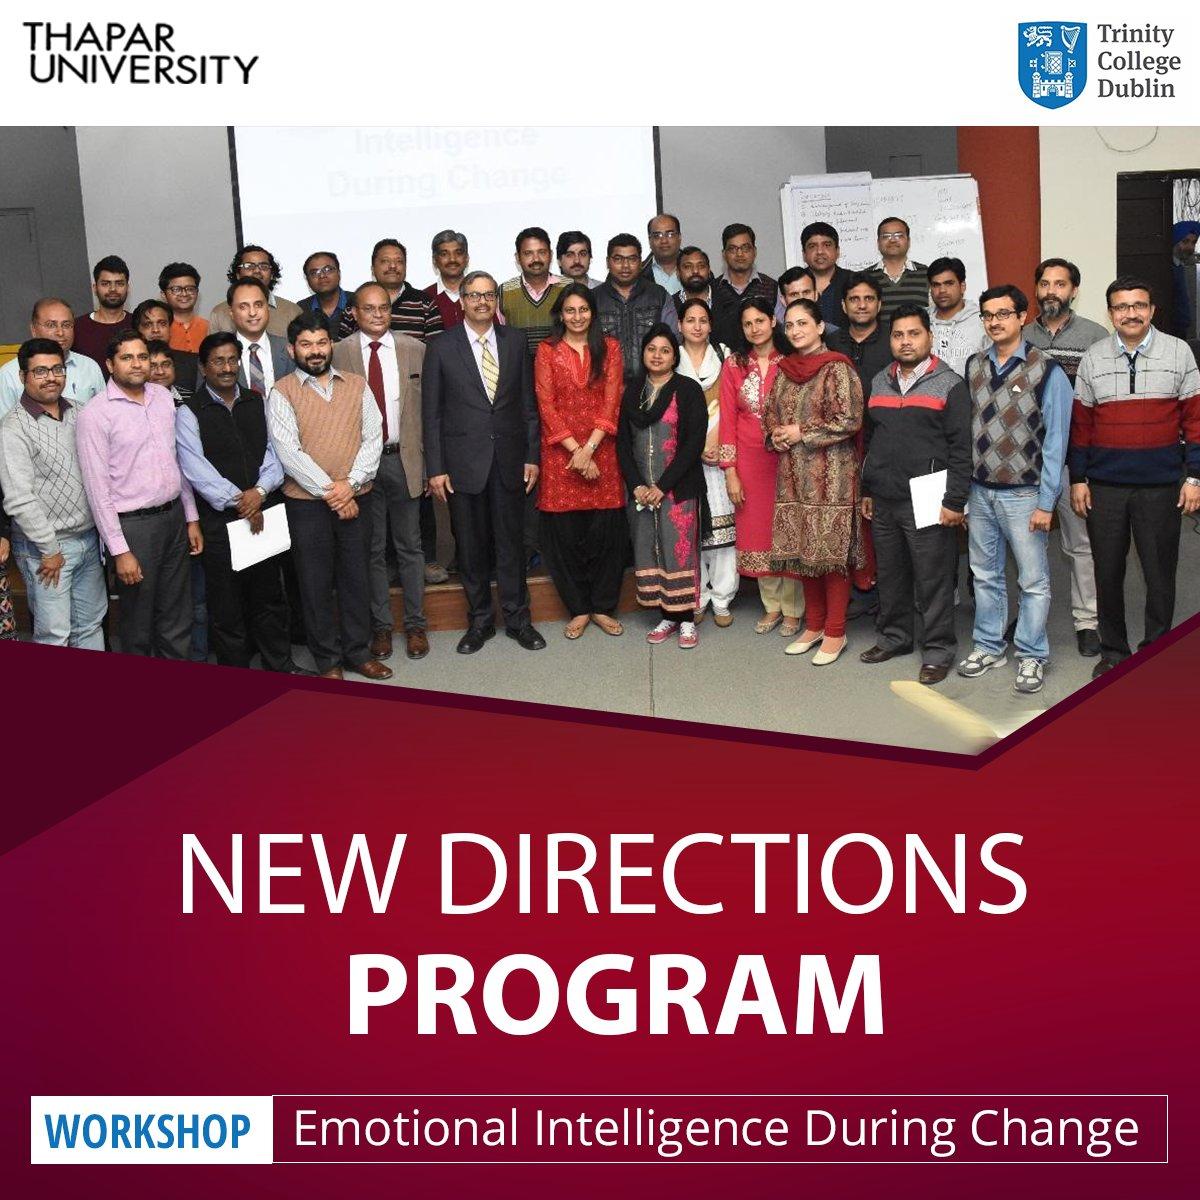 &#39;Emotional Intelligence During Change&#39; #workshop shed light on internal #motivation, #SelfAwareness, #empathy and social #skills.<br>http://pic.twitter.com/6uJVAuLbJq